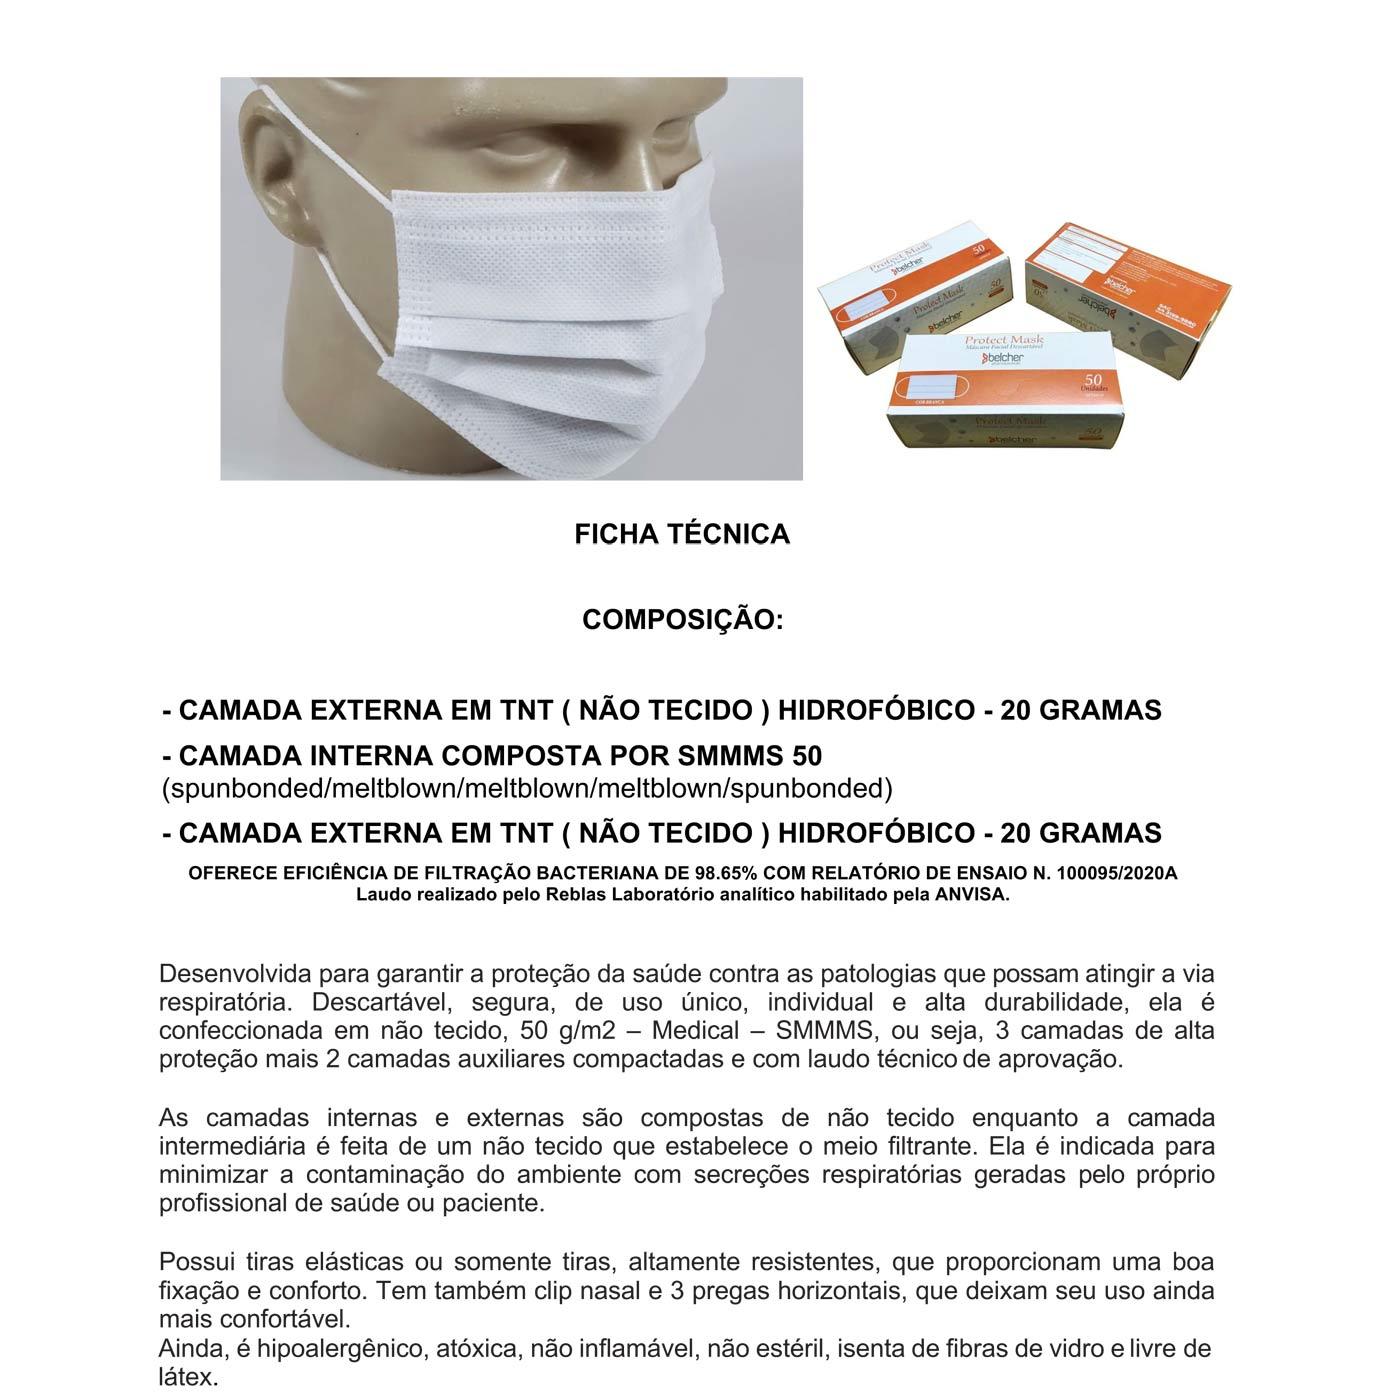 Máscara Cirúrgica Descartável Cinco Camadas SMMMS-50 TNT - Caixa com 50 Unidades  - Loja Saúde - Diagnósticos e Produtos Naturais